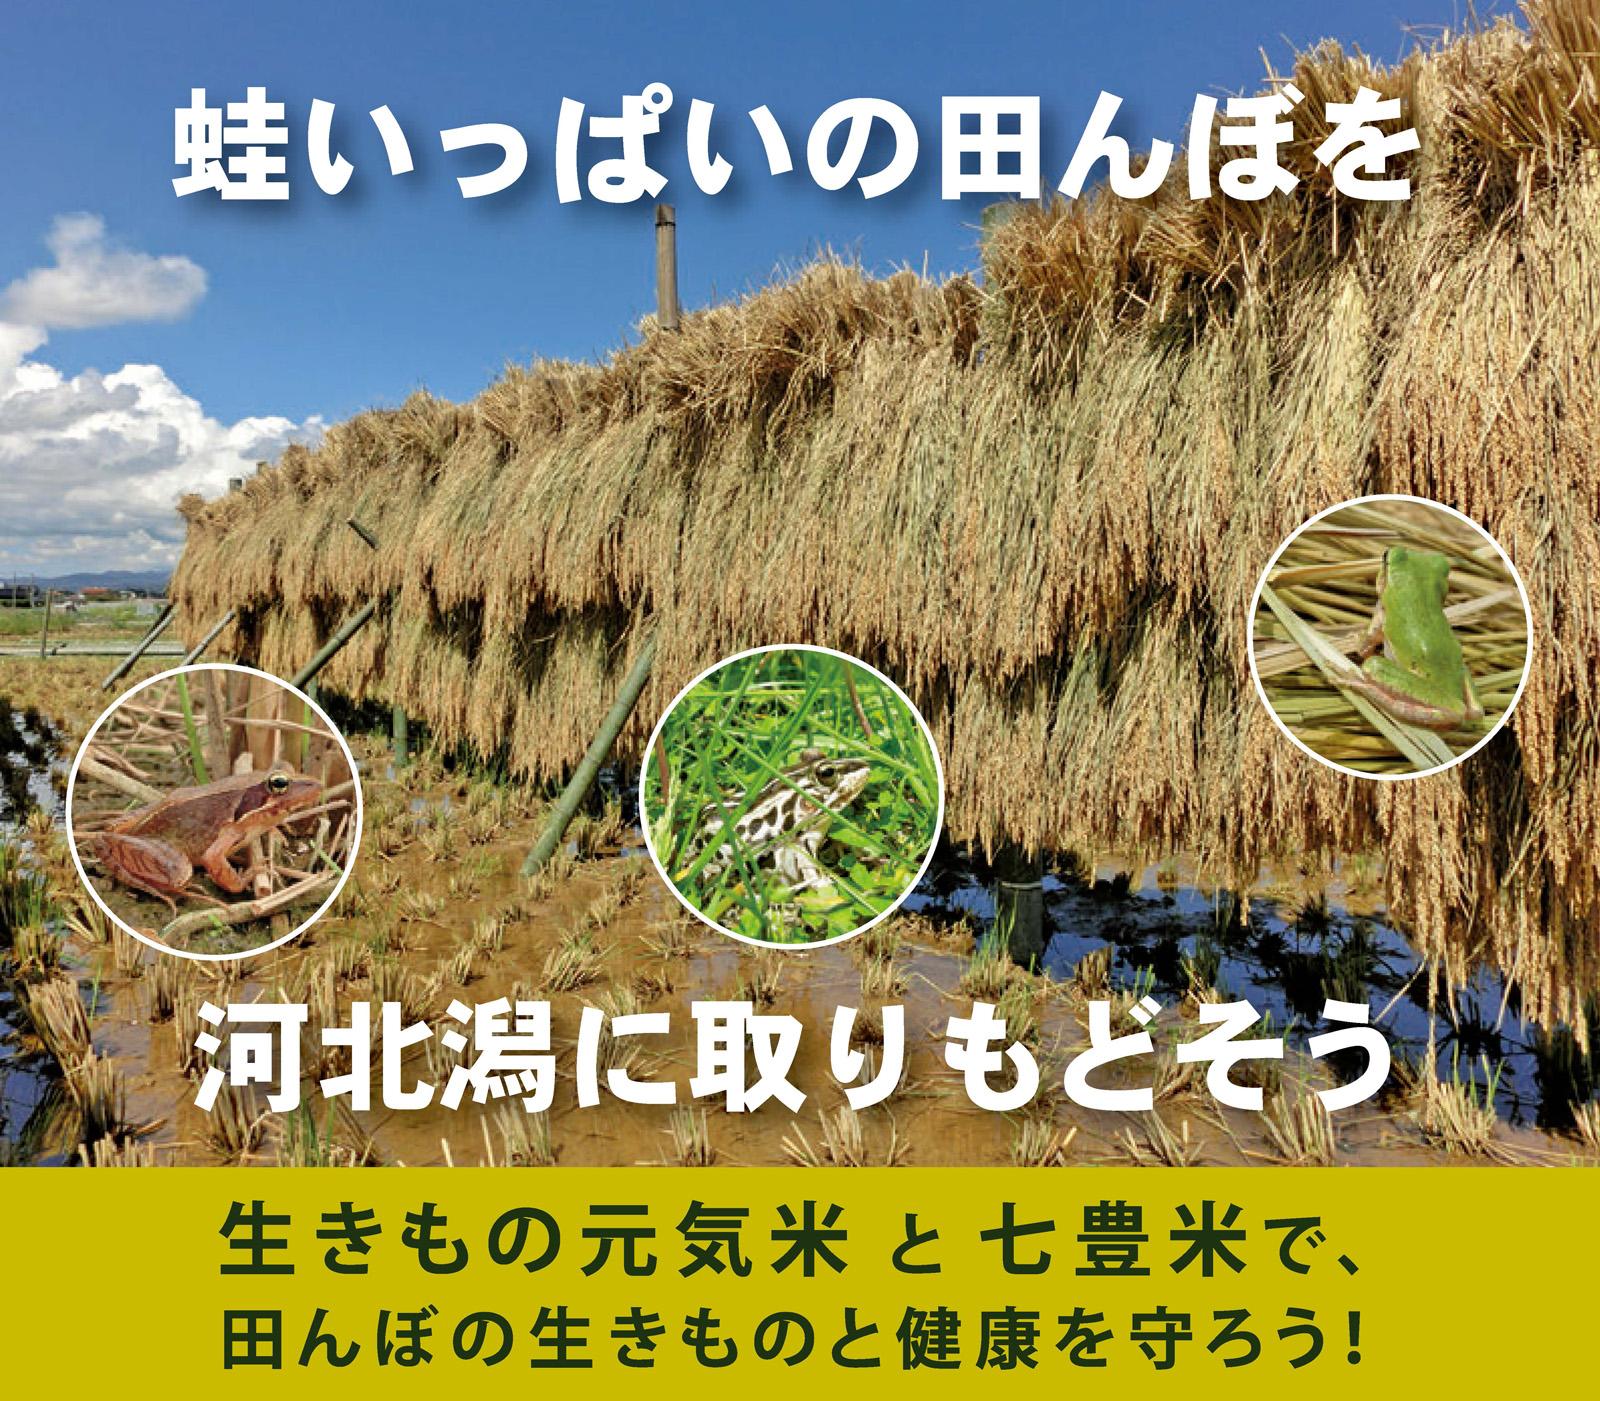 ninteirenkeijigyo5_kahokugatakosyo